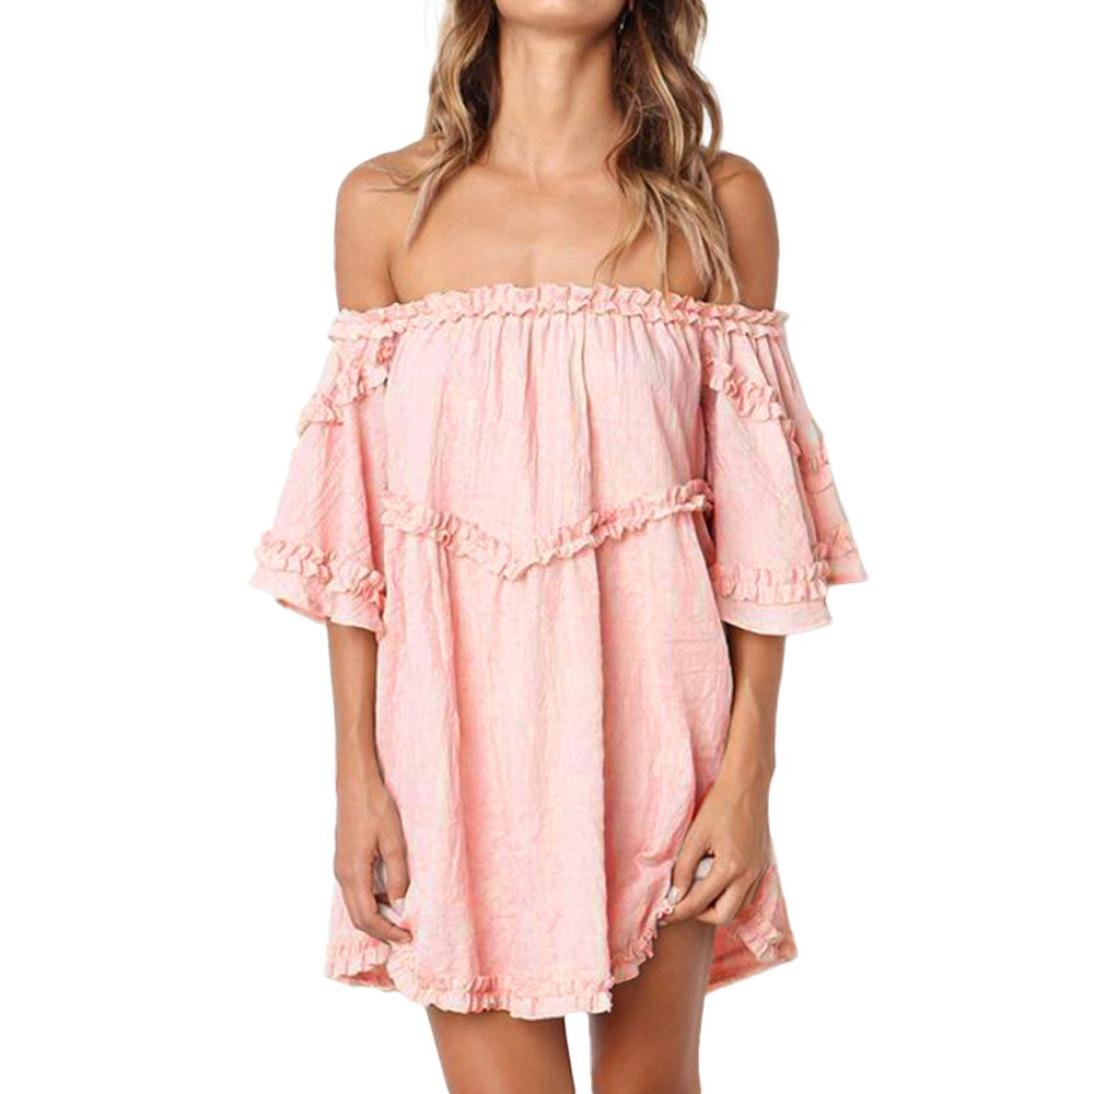 Caopixx 2018 Short Mini Dresses Womens Off Shoulder Beach Dresses Ruffle Half Sleeve Party Dress